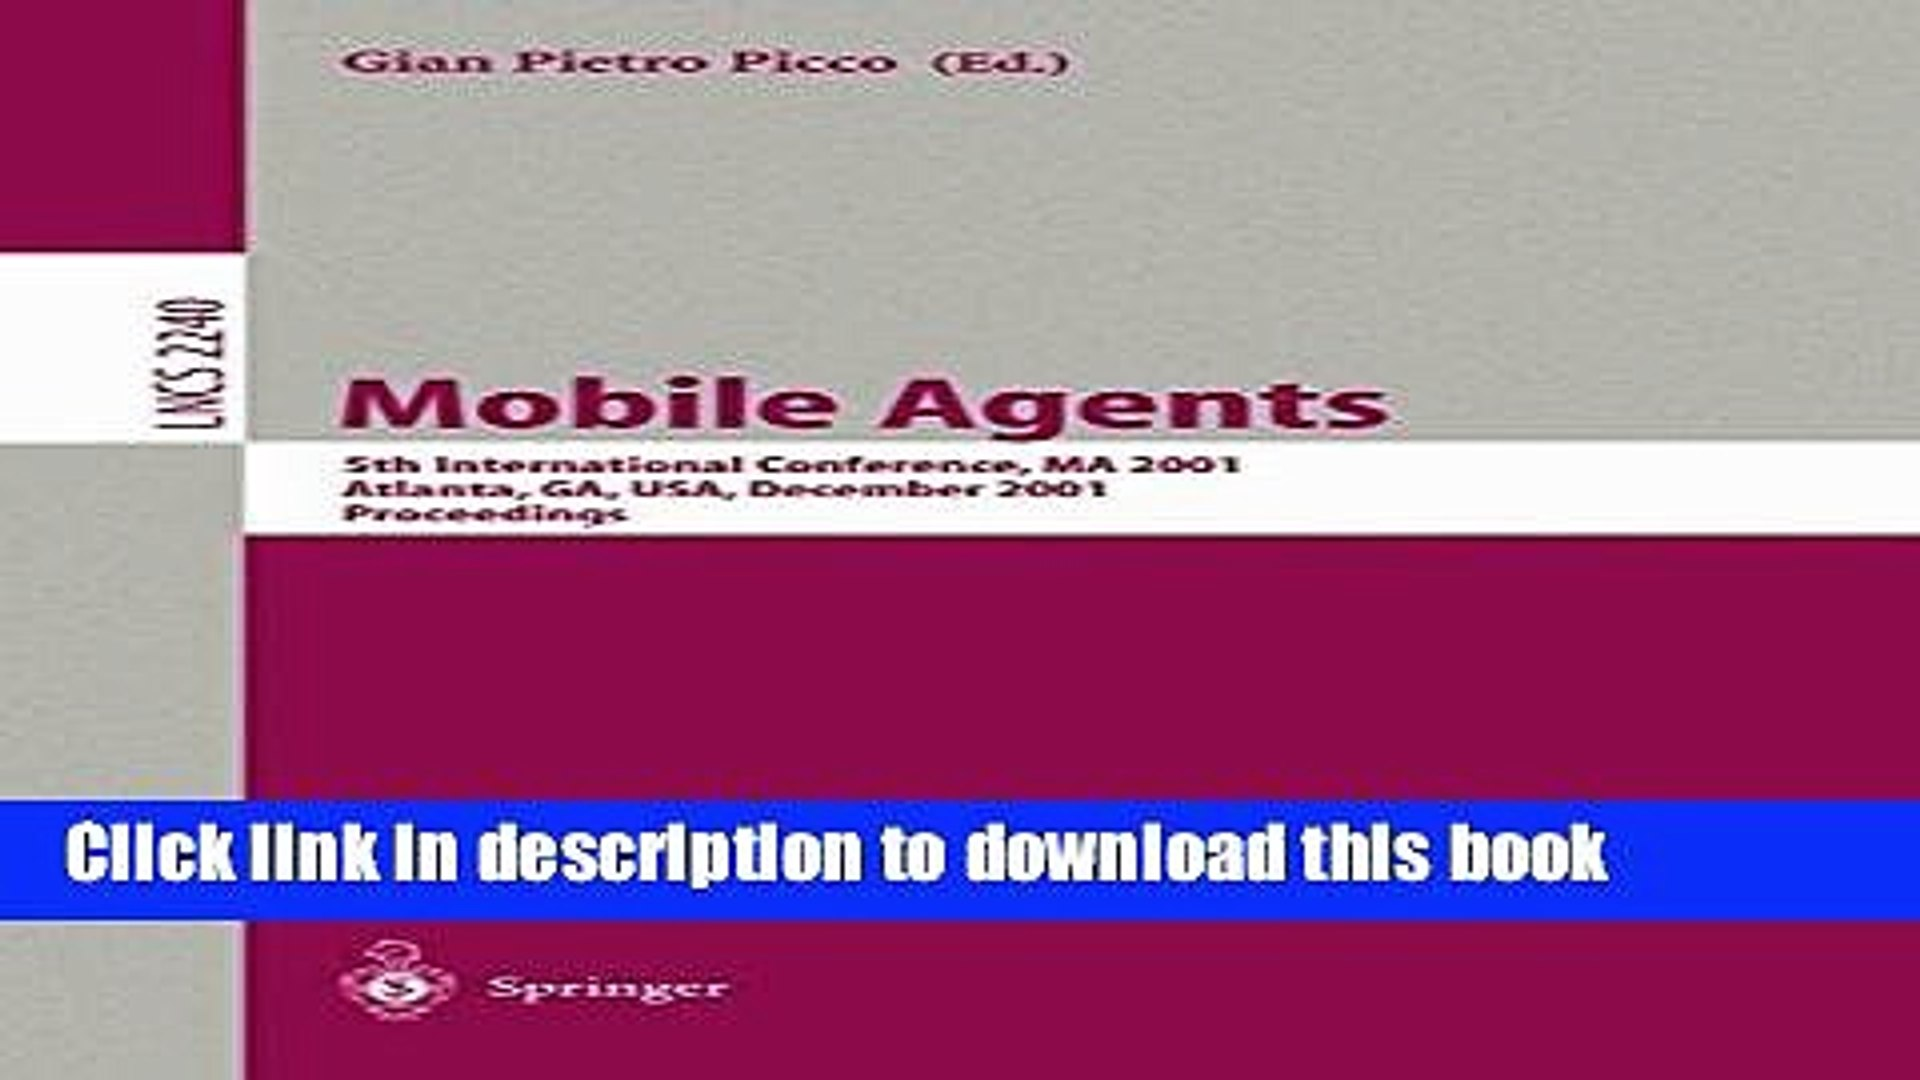 Download Mobile Agents: 5th International Conference, MA 2001 Atlanta, GA, USA, December 2-4, 2001